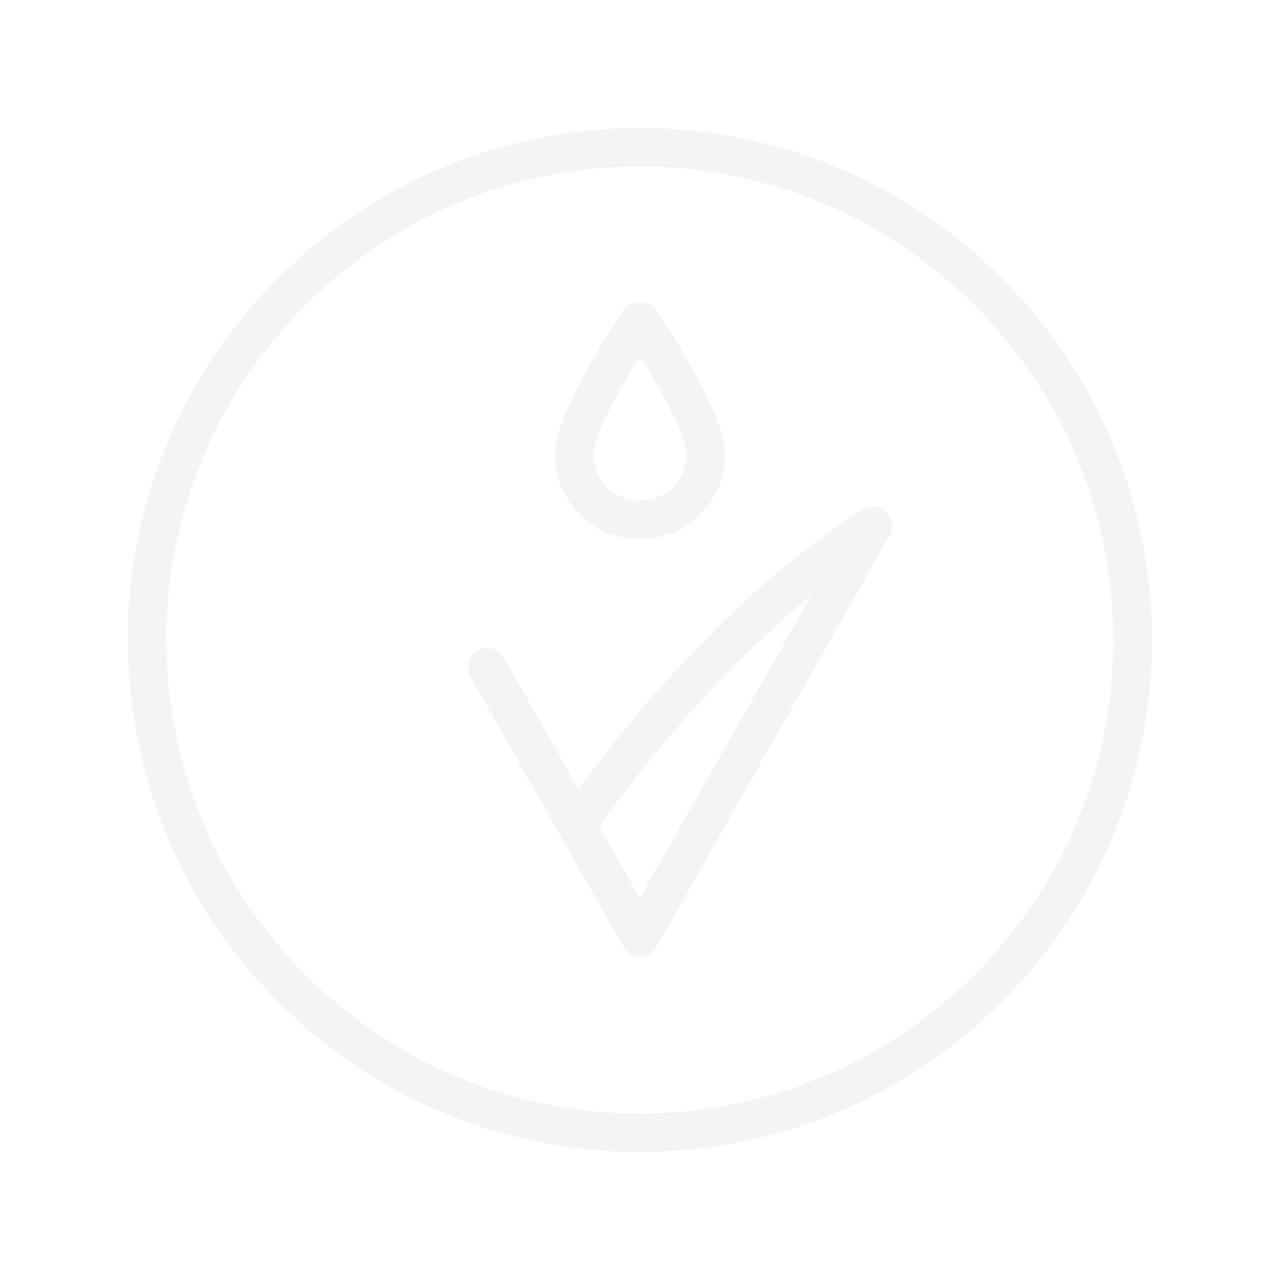 SLEEK MAKEUP Twist Up Lip Pencil No.994 Shabby Chic 0.3g